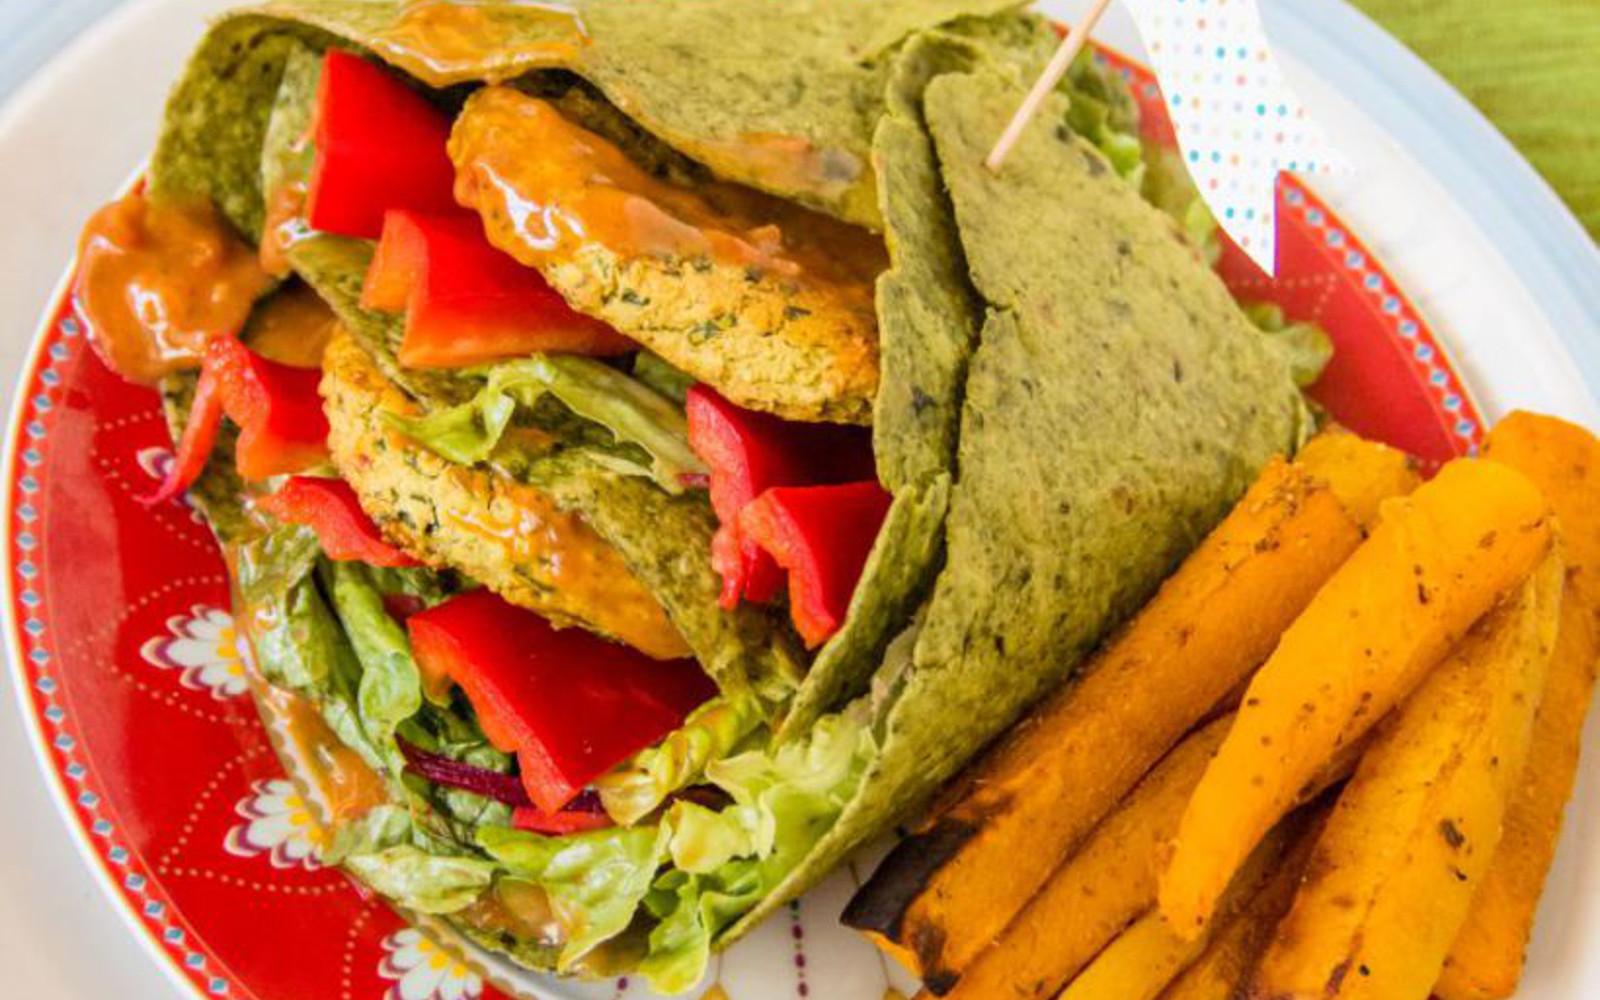 Red Lentil Burger Wraps With Pumpkin Fries